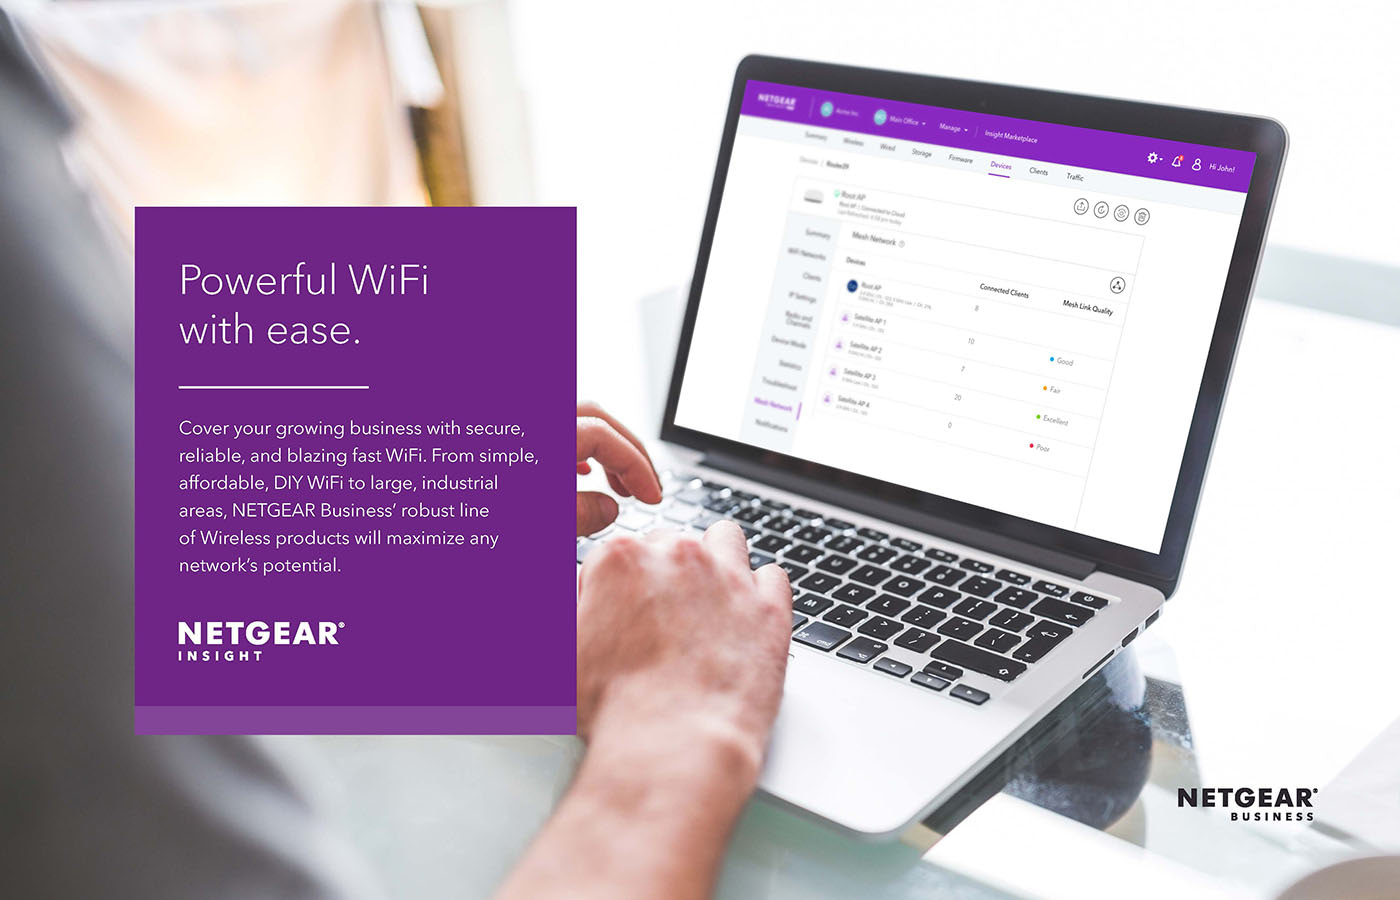 Image with NETGEAR Insight app design with description